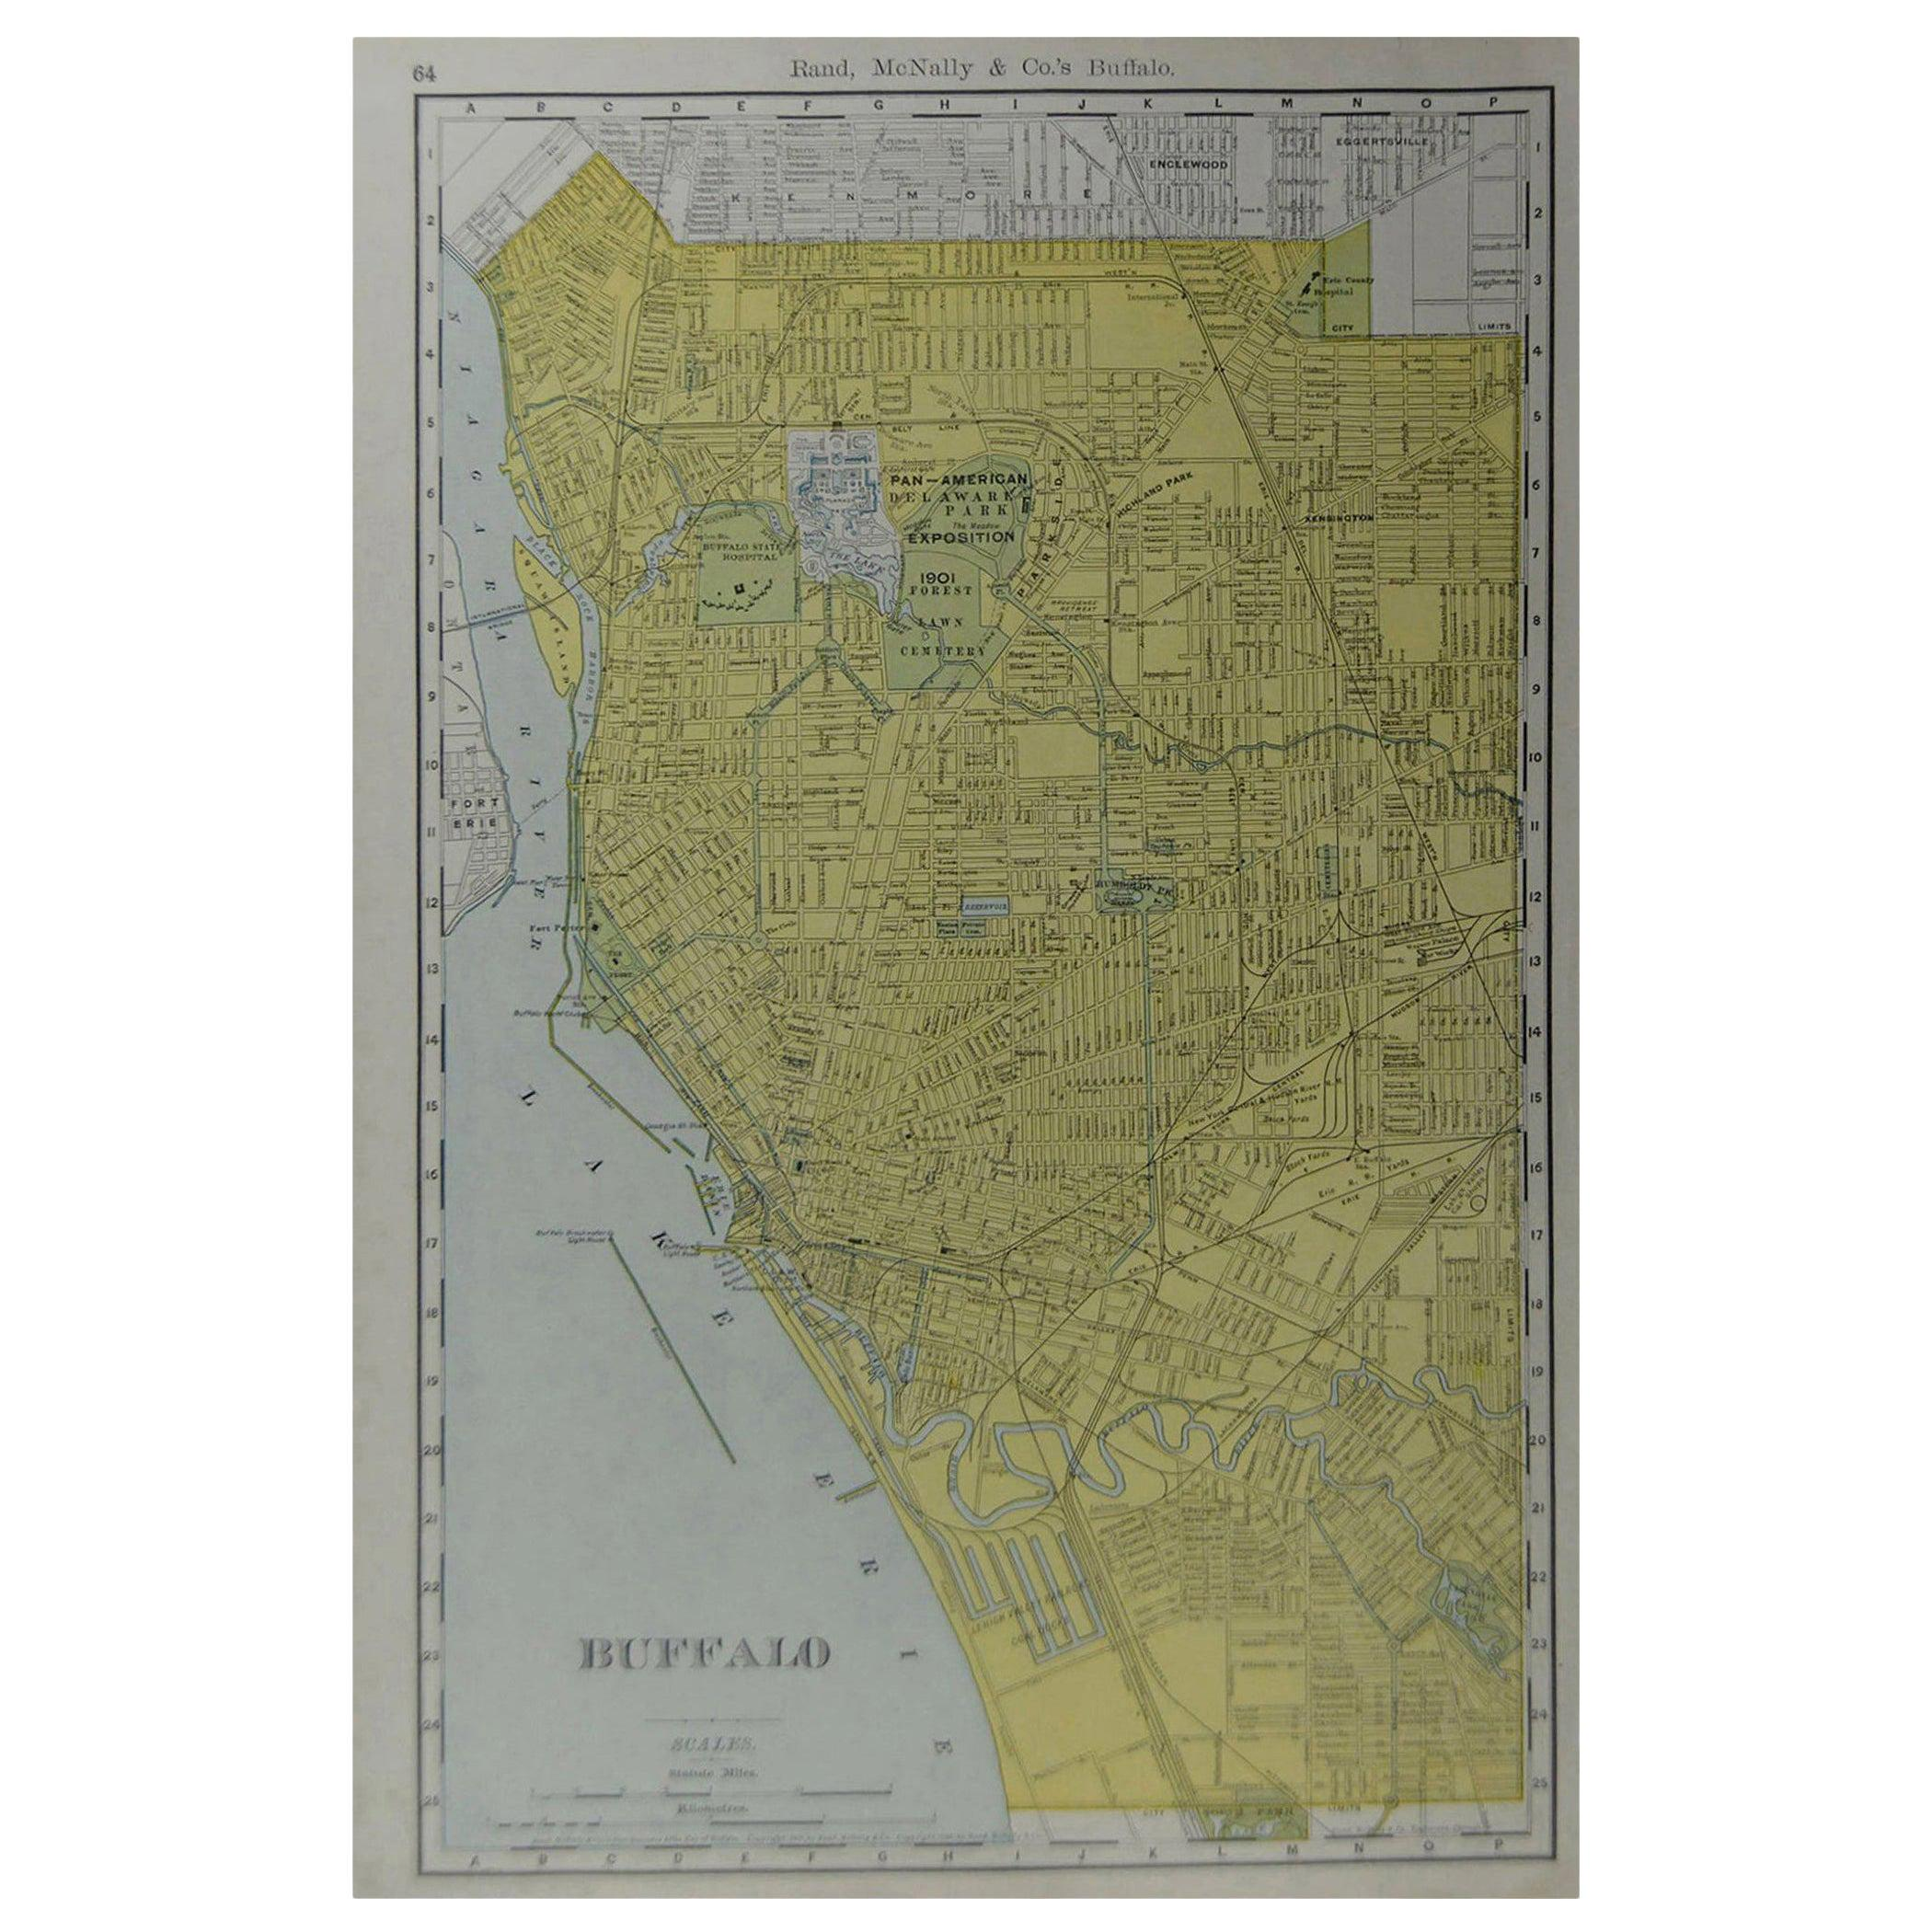 Original Antique City Plan of Buffalo, New York, USA, circa 1900